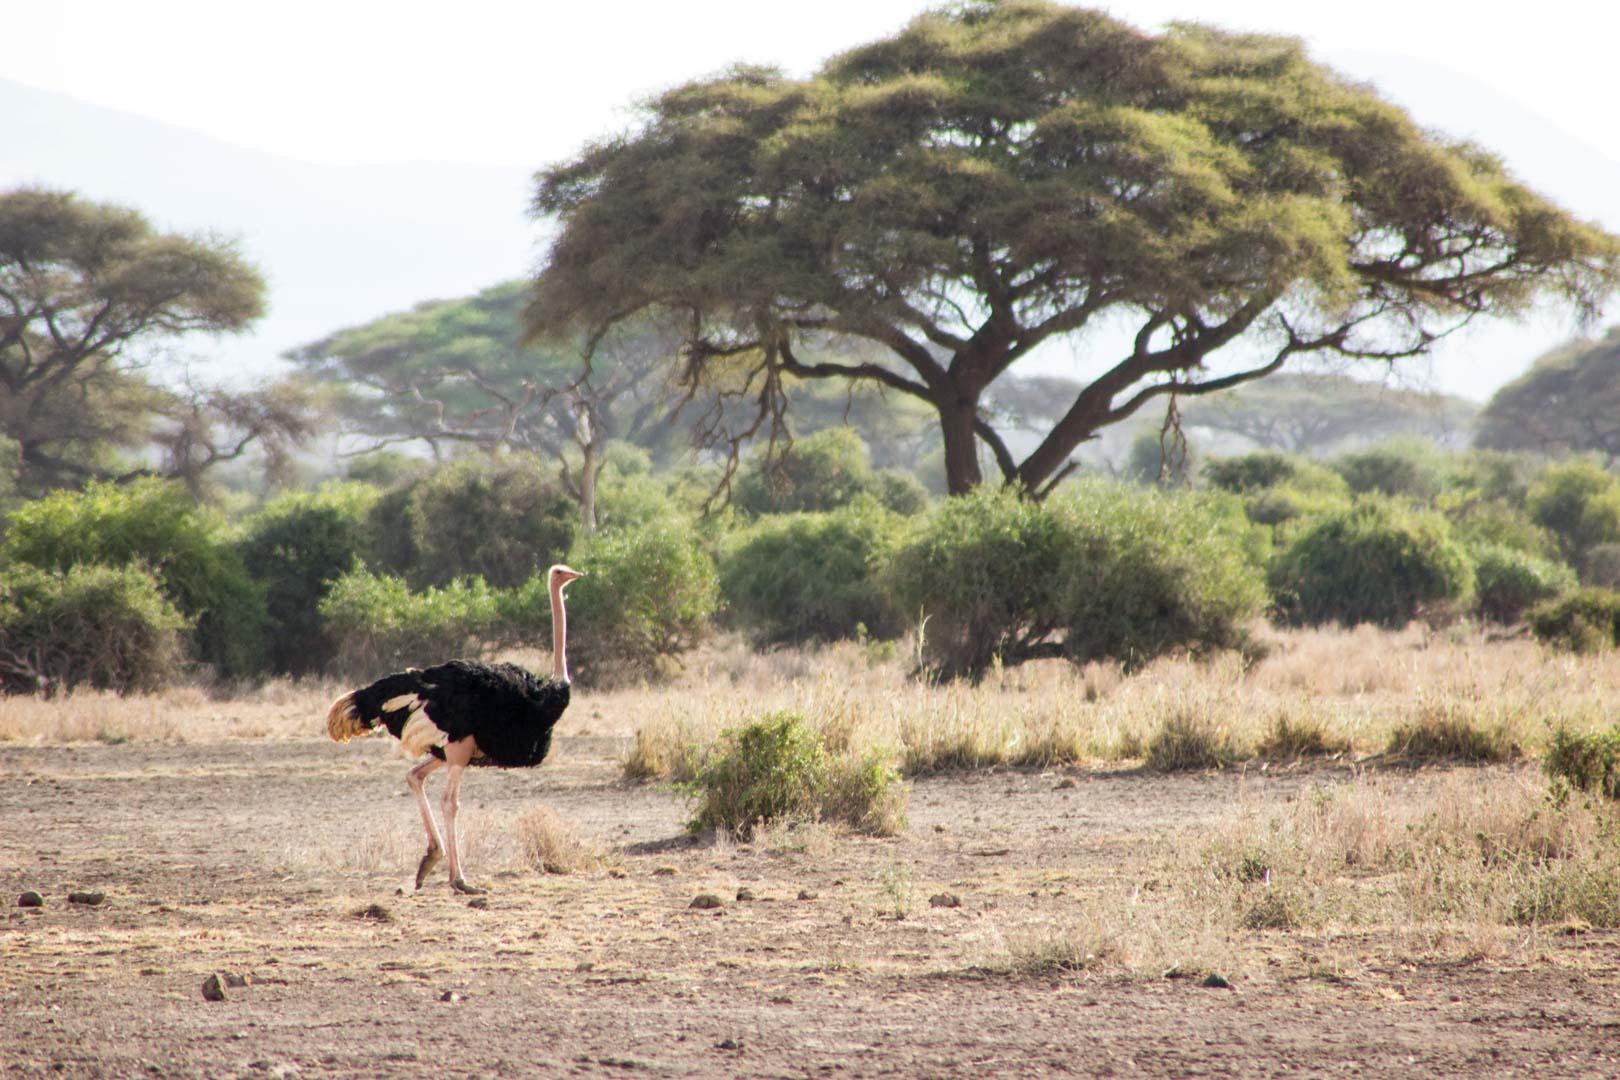 Avestruz, Parque Nacional de Amboseli, Kenia